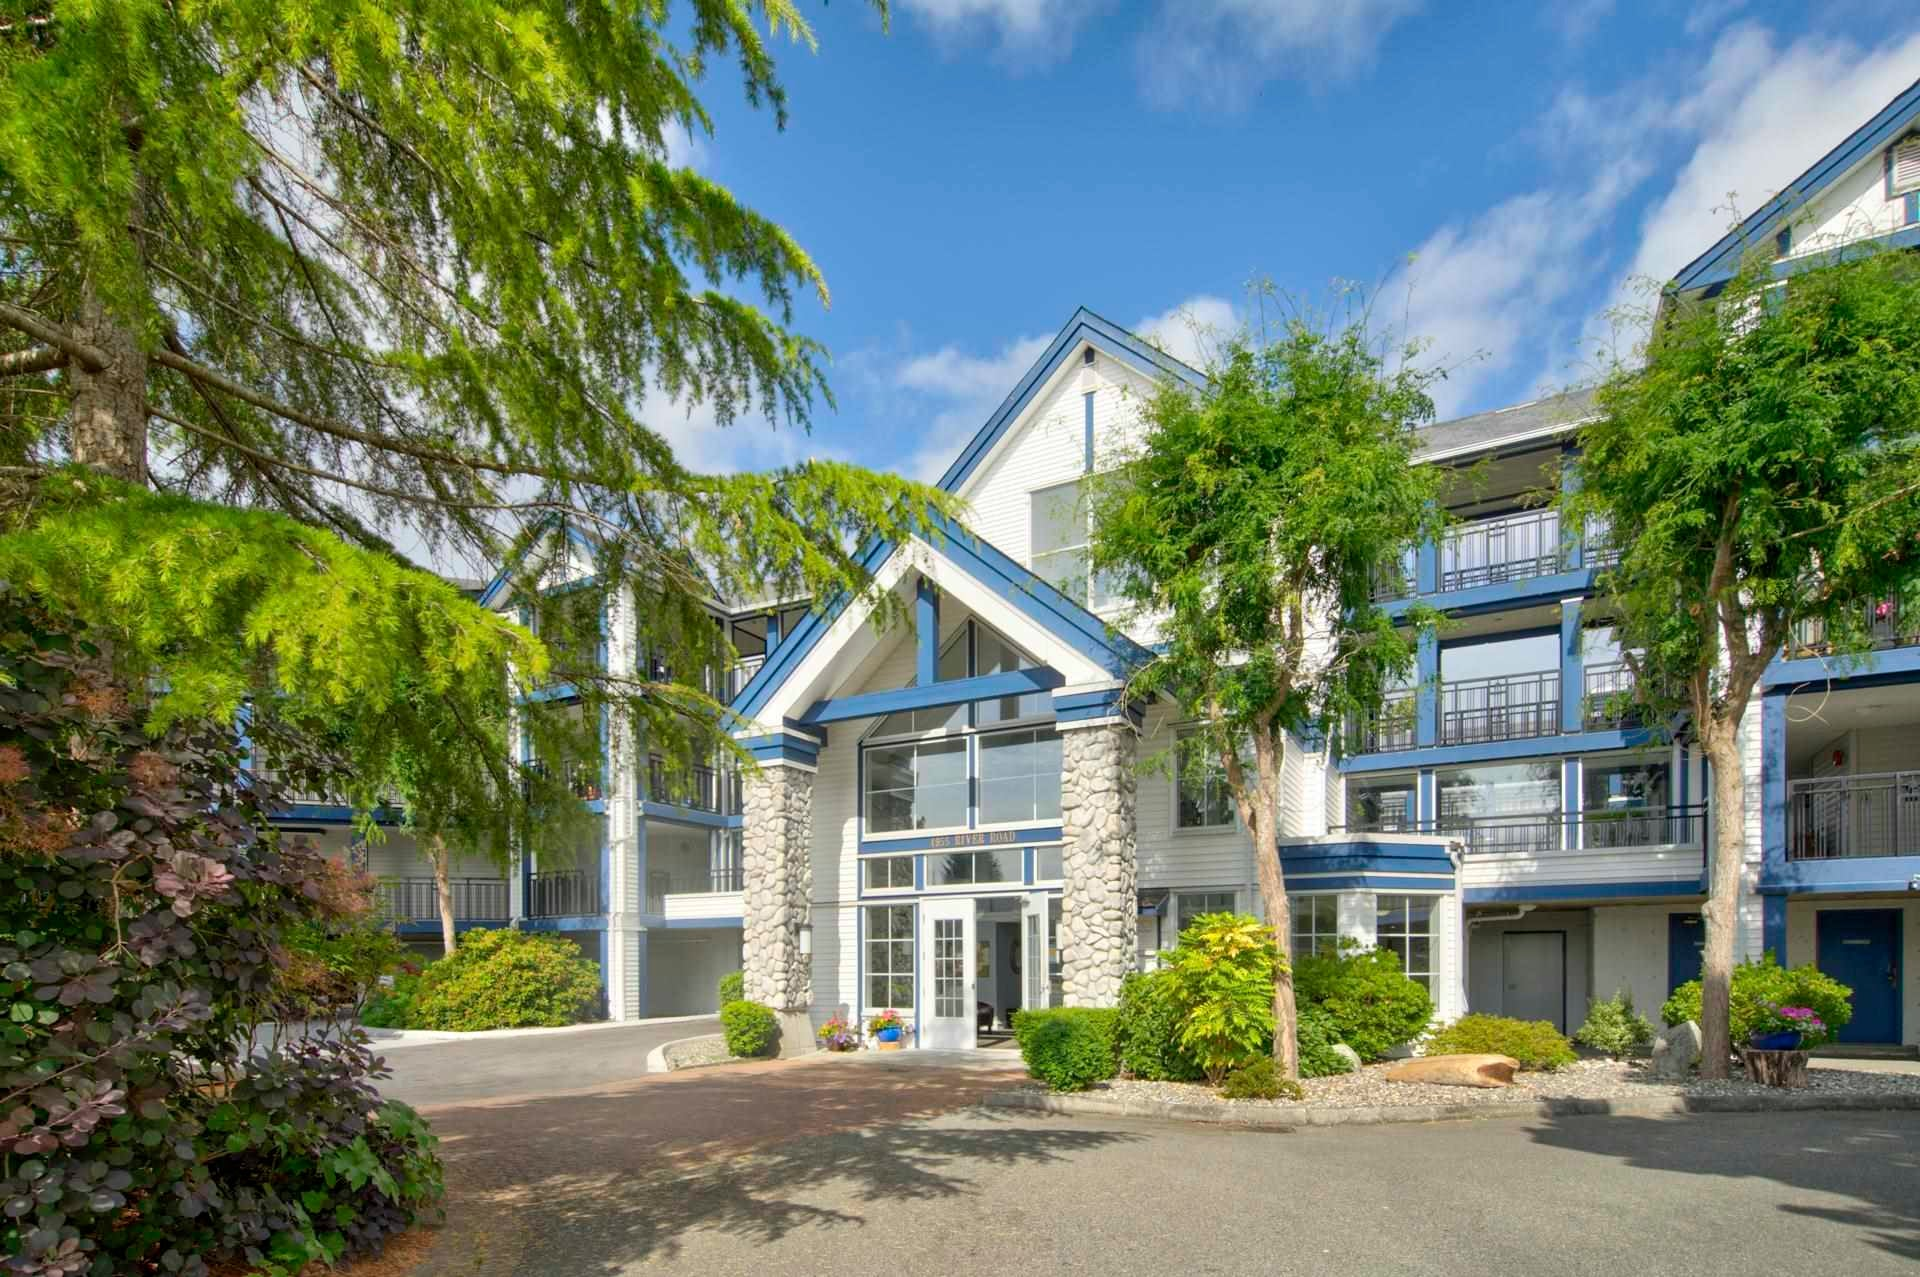 320 4955 RIVER ROAD - Neilsen Grove Apartment/Condo for sale, 2 Bedrooms (R2606058)